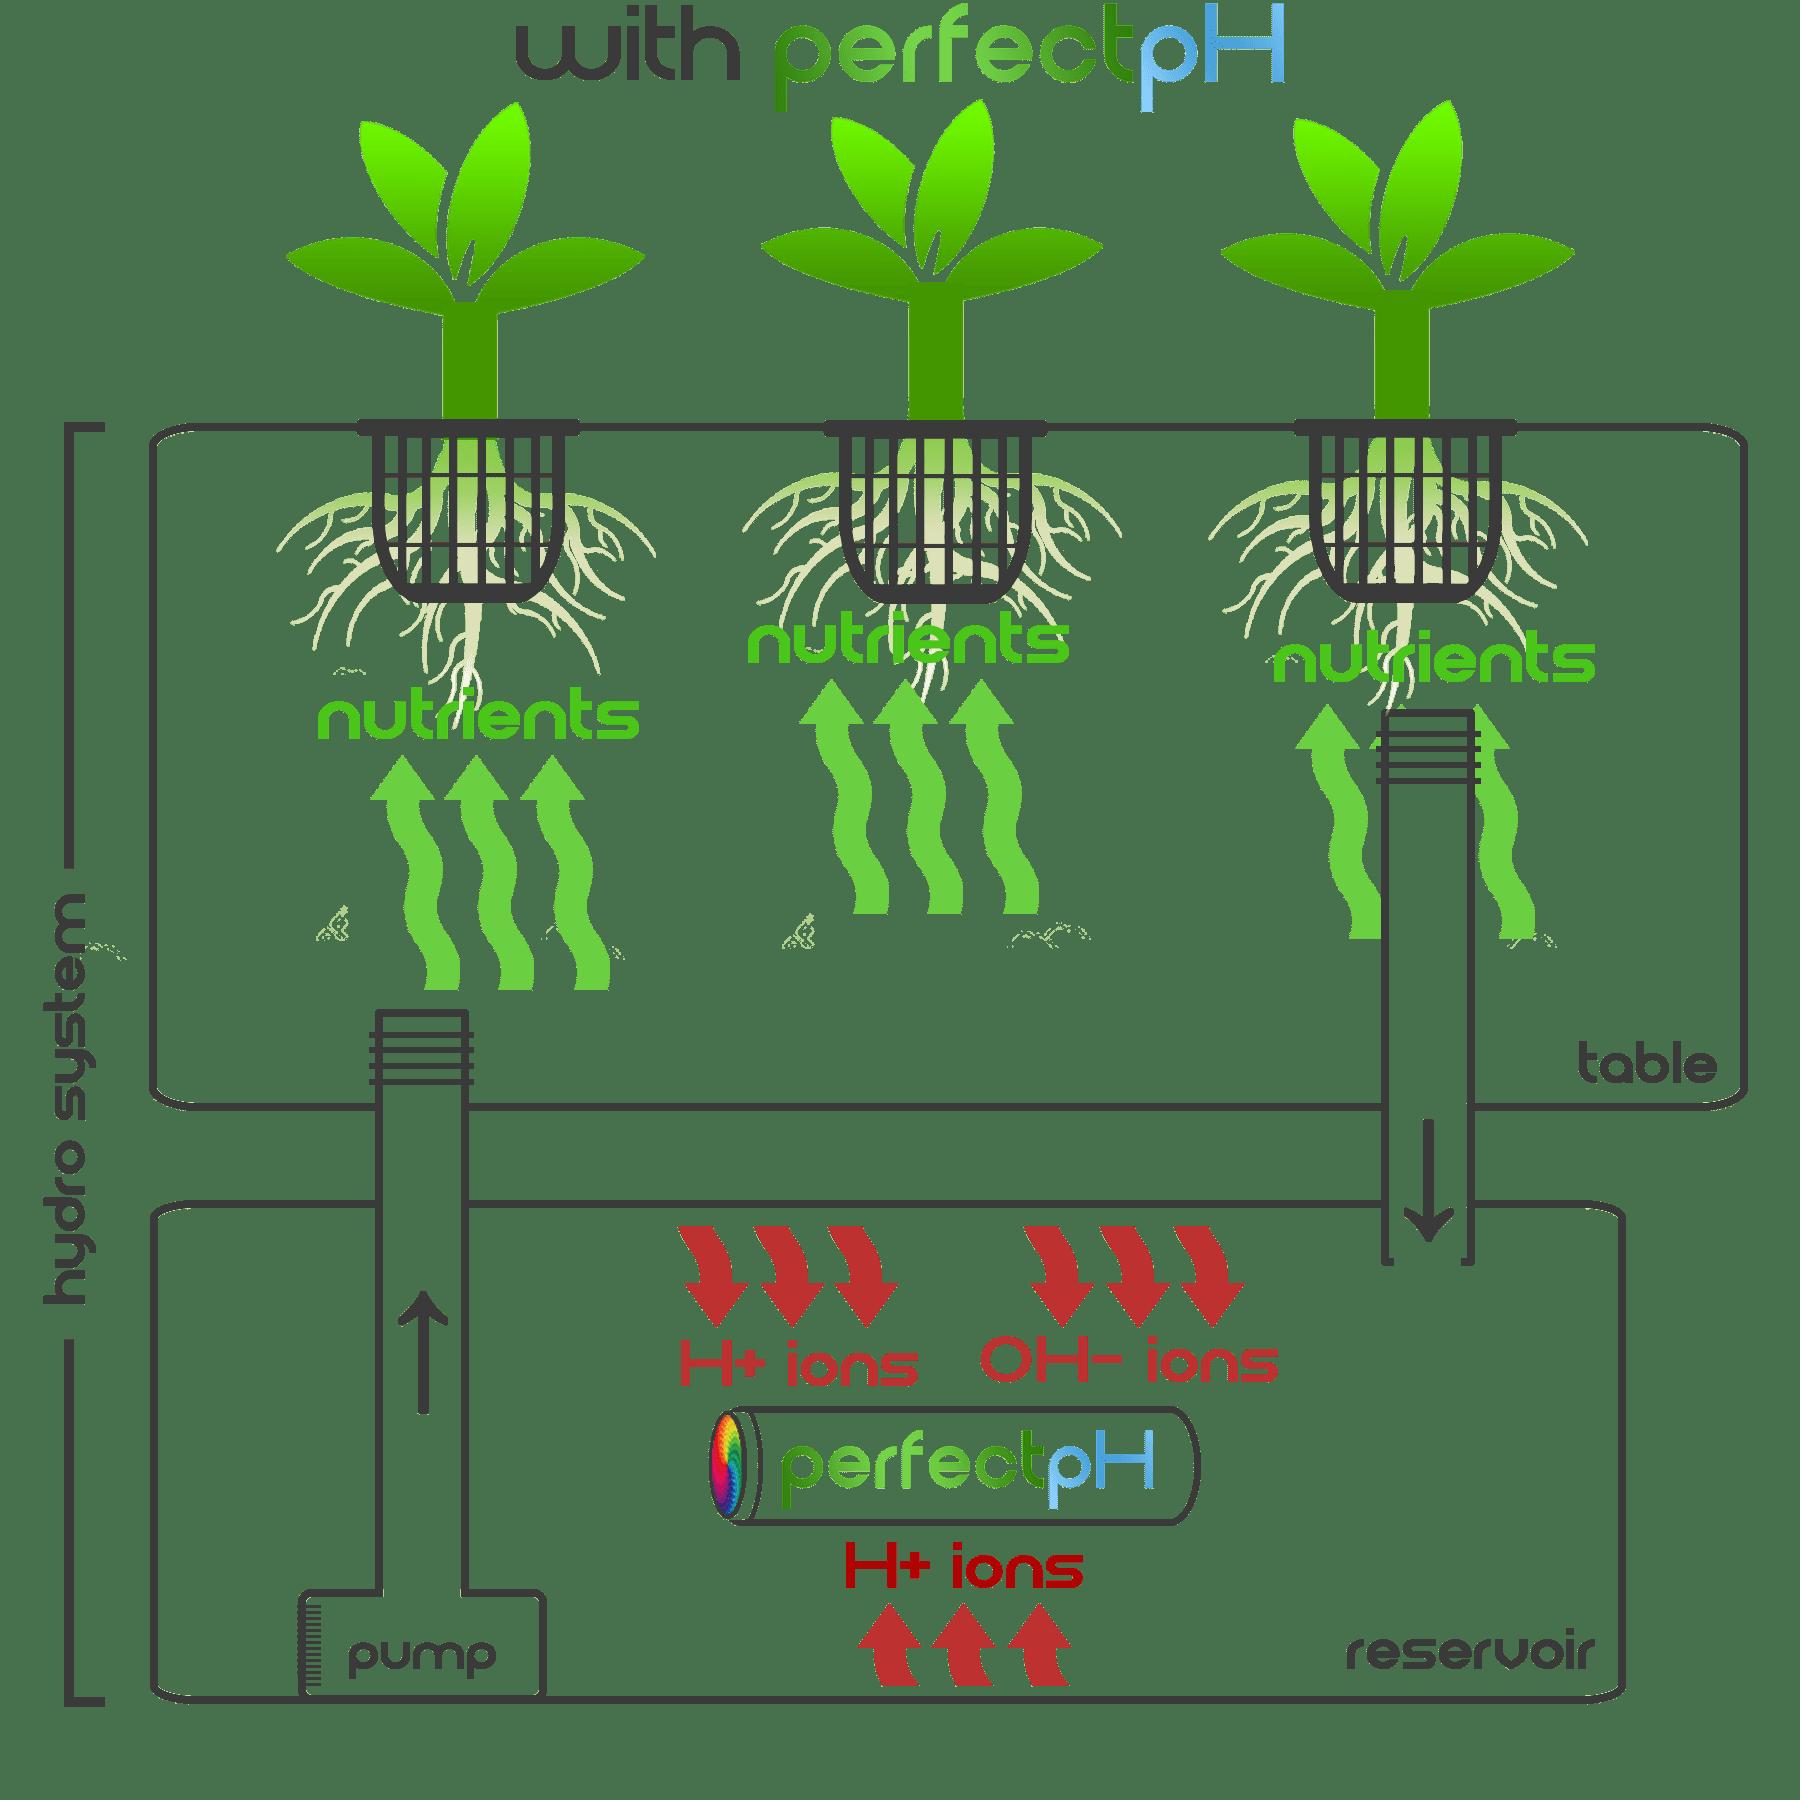 ion chart w pph